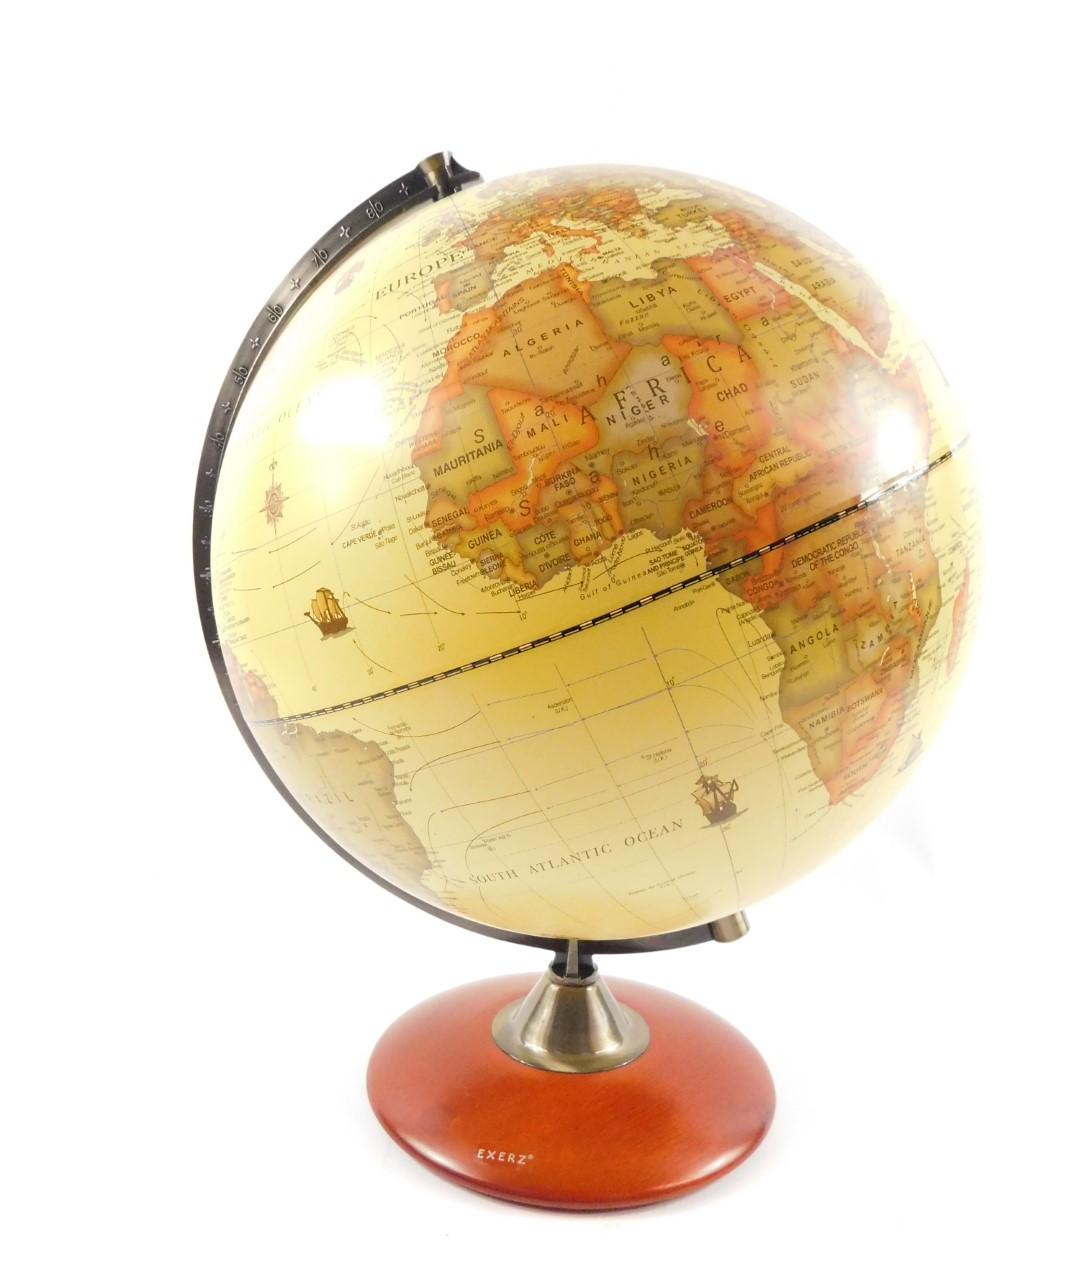 Lot 42 - An Exerz terrestrial 'antique' desk top globe, 41cm H.